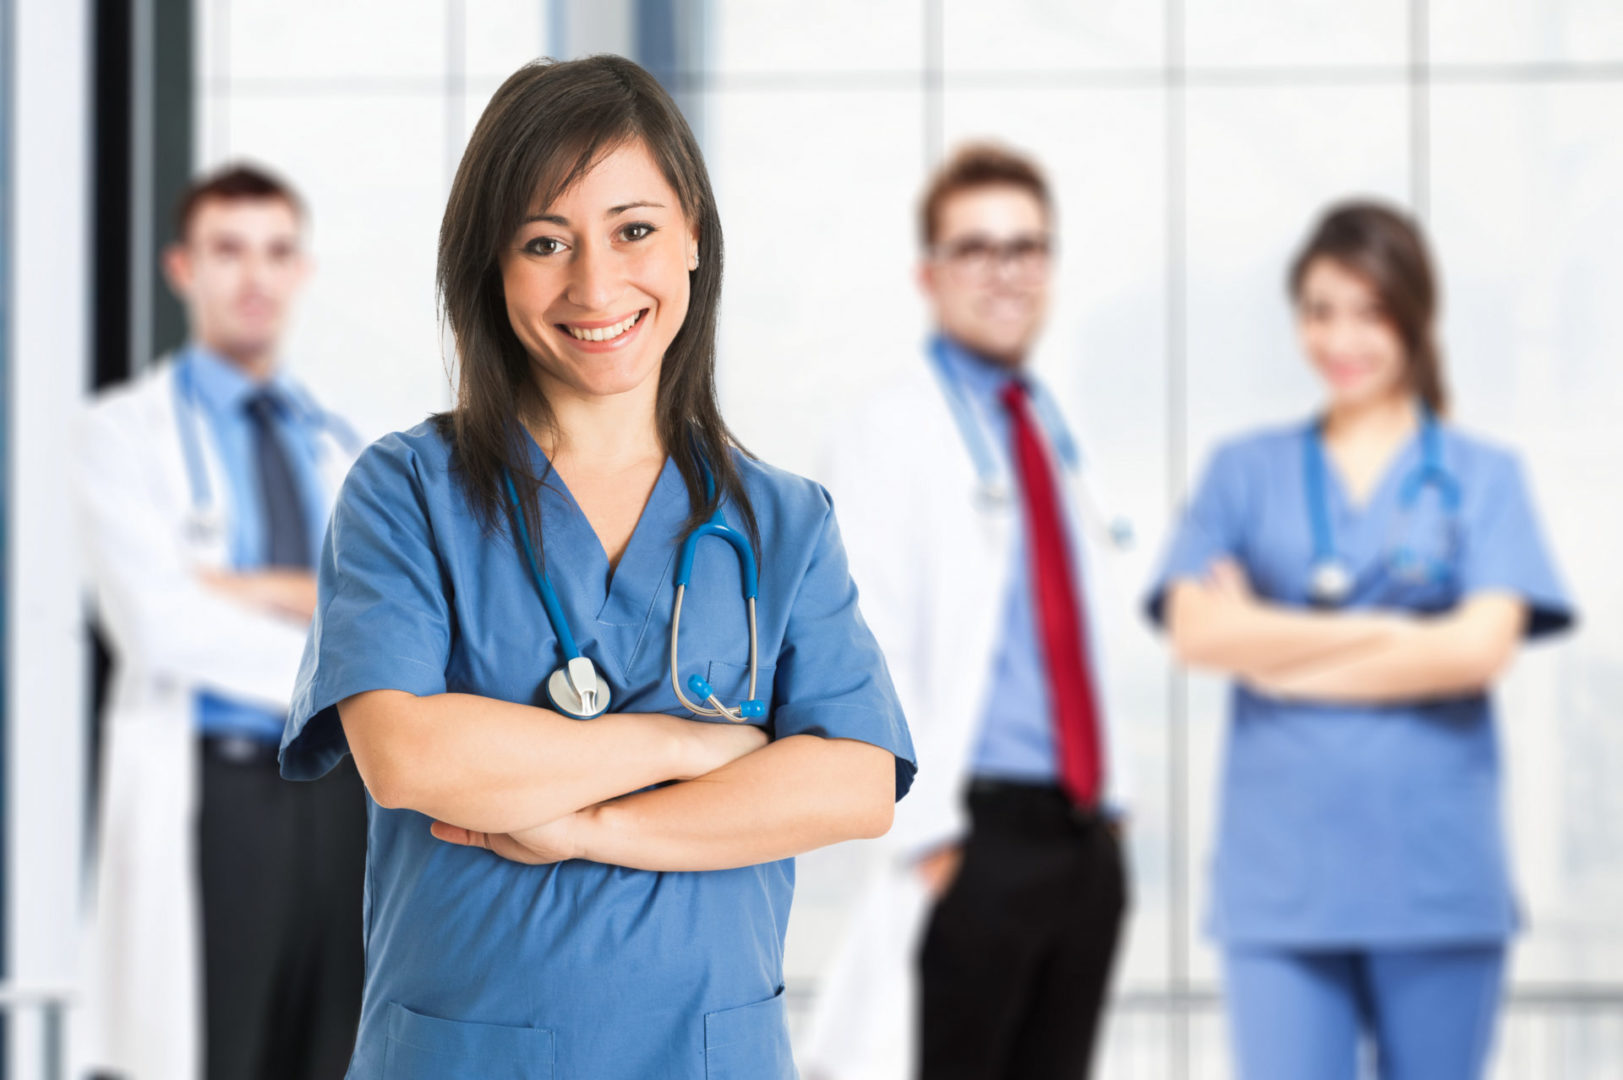 medical assisting degree FTC